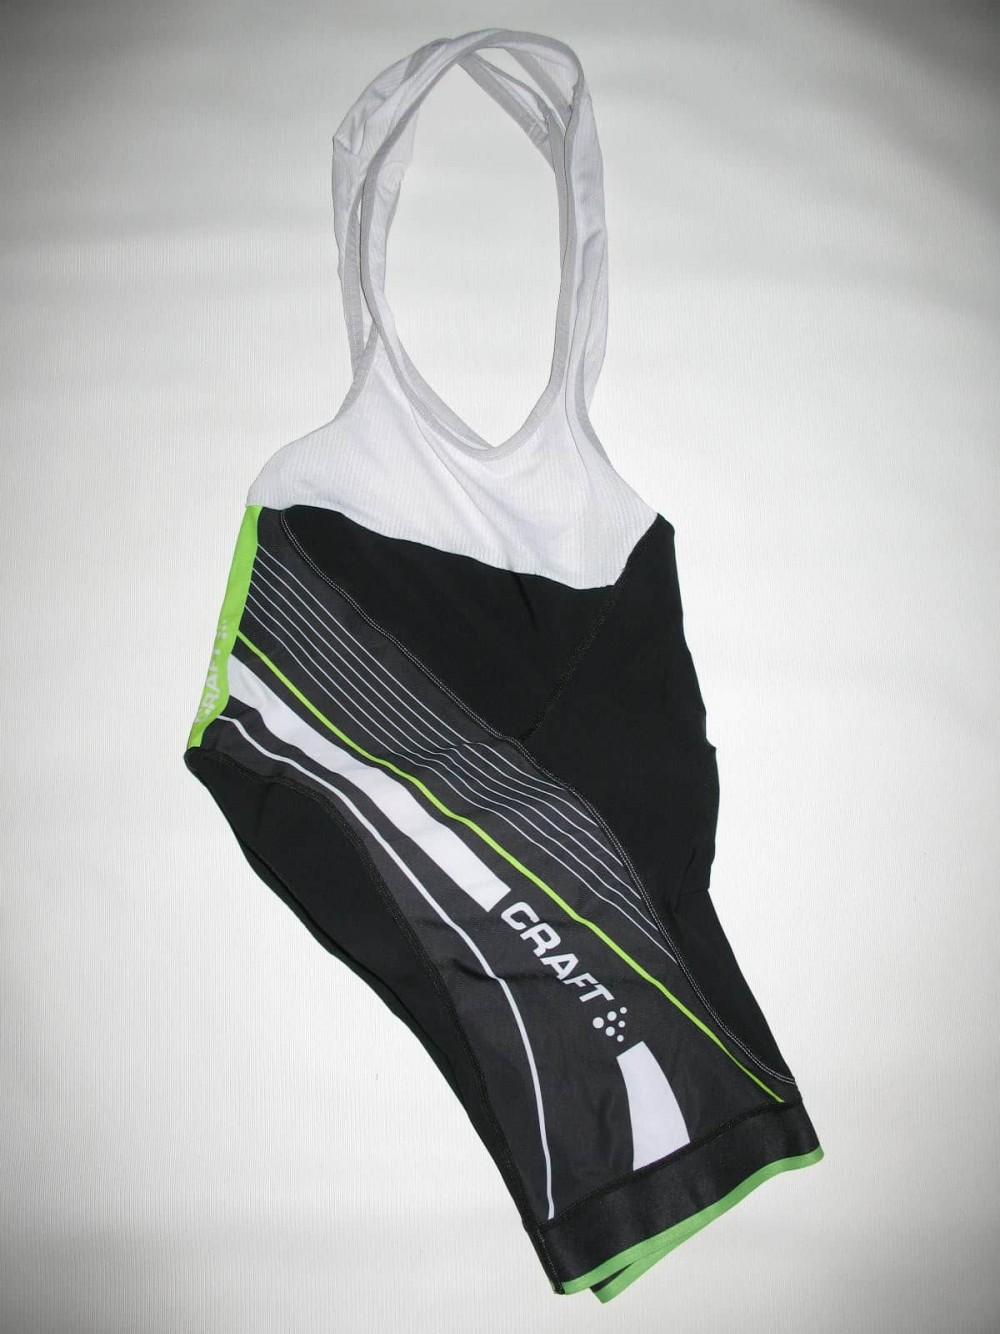 Велошорты CRAFT grand tour bib shorts (размер S) - 2